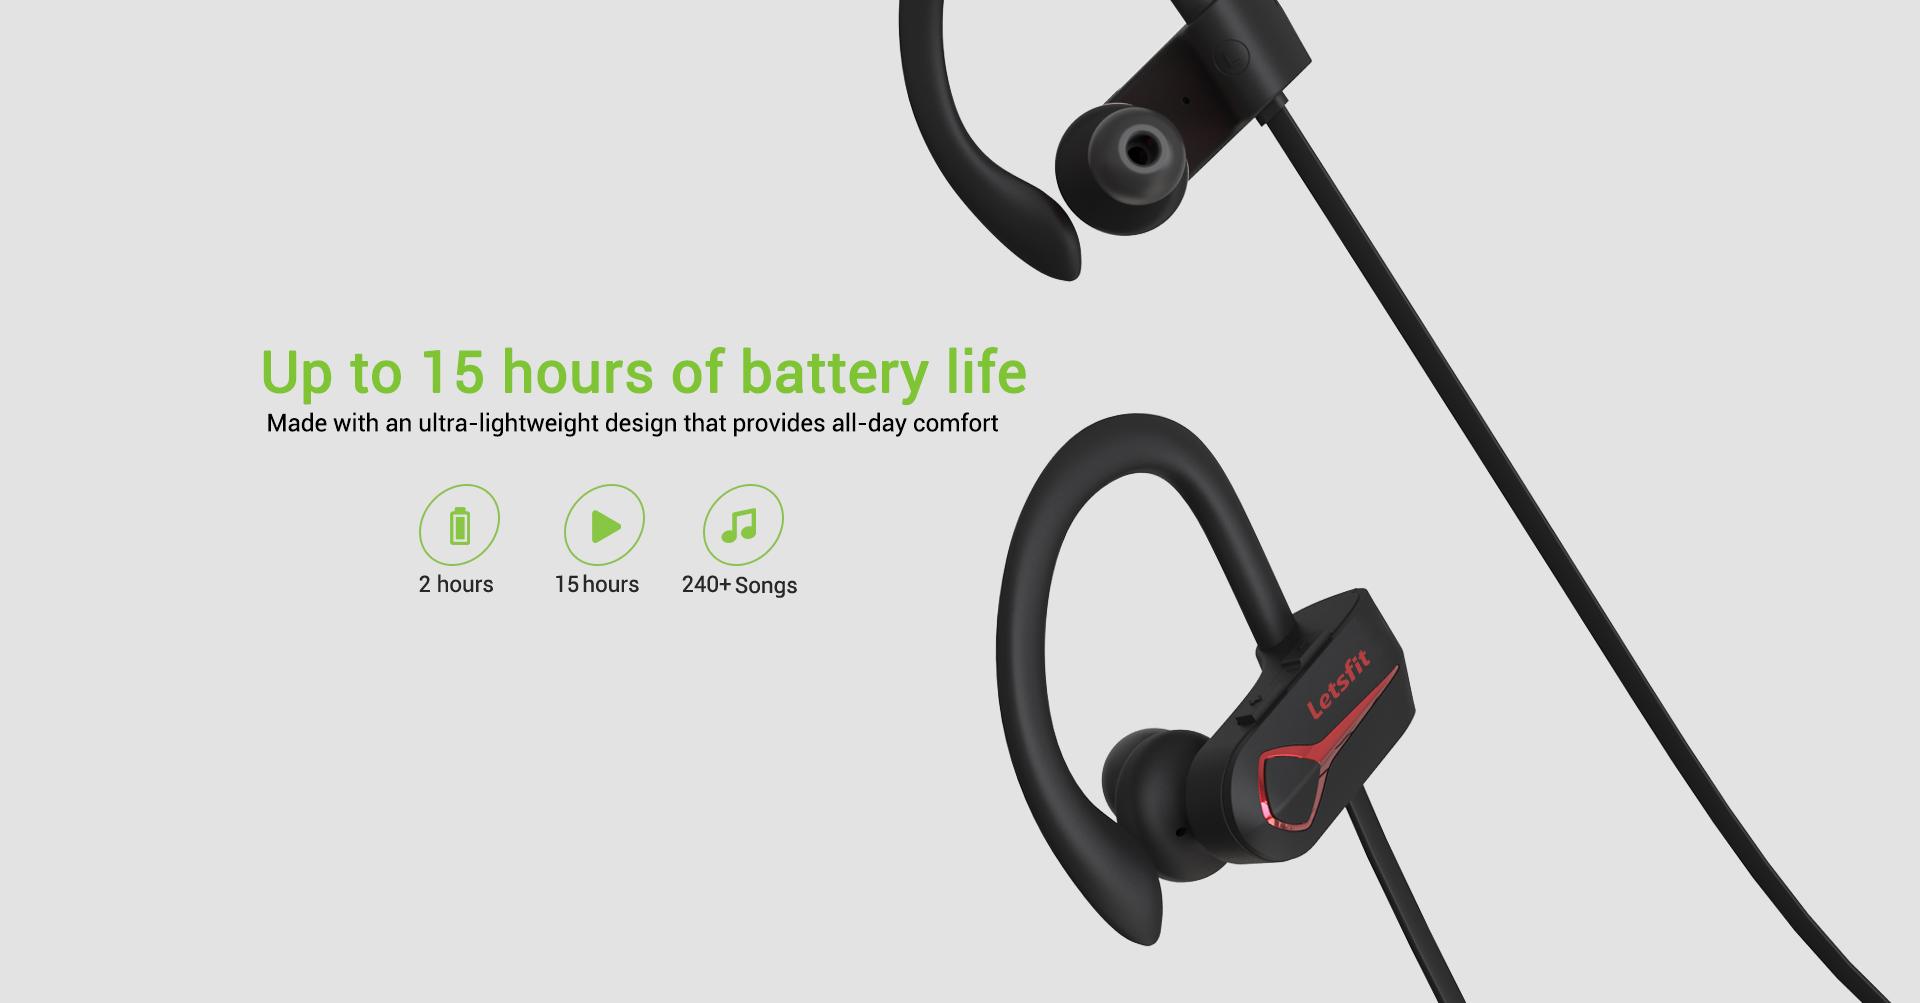 wireless sports headphones long battery life